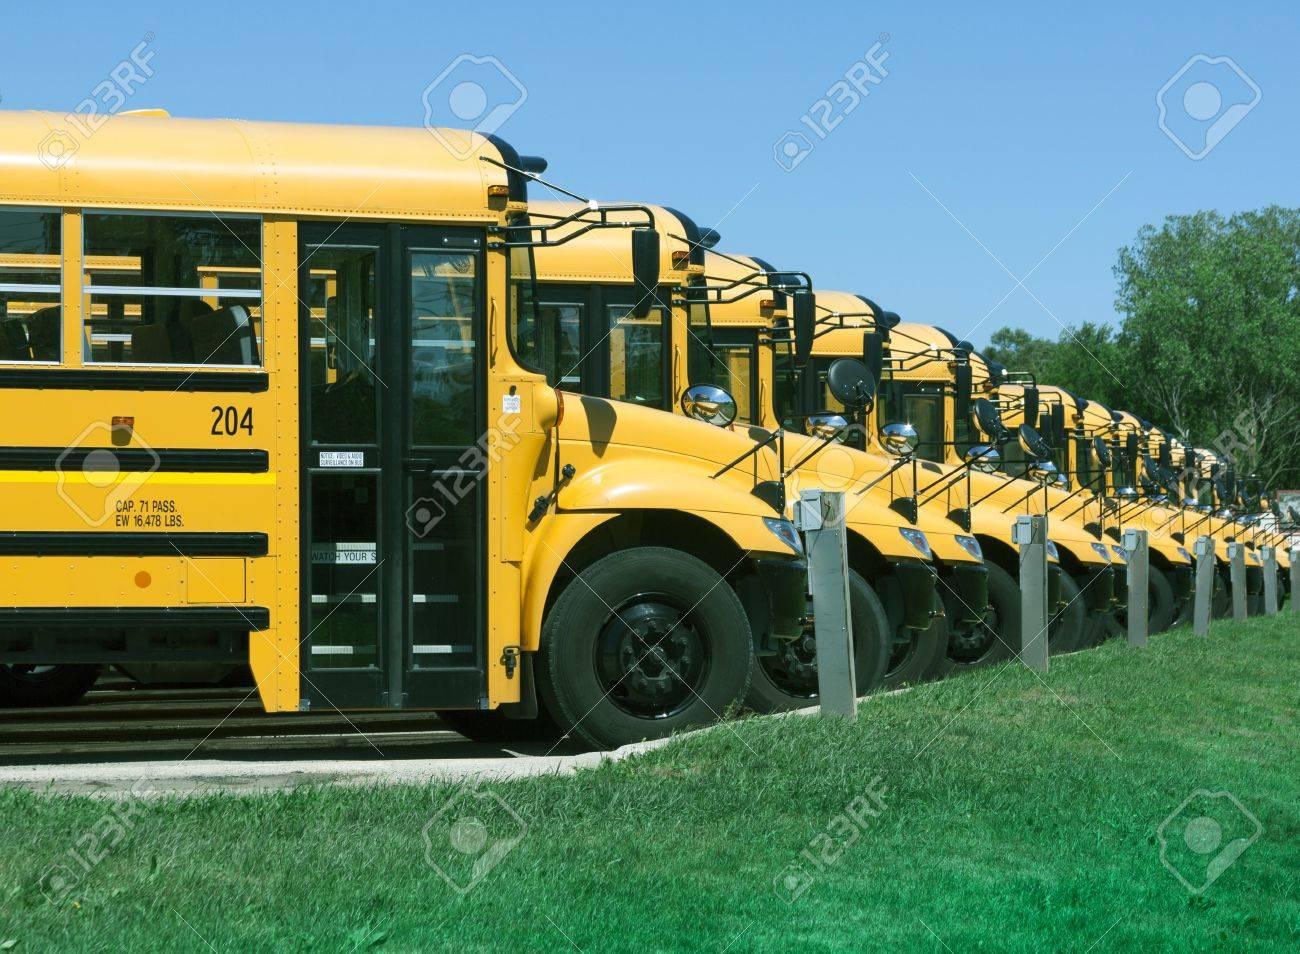 yellow school buses in parking lot foto royalty free gravuras